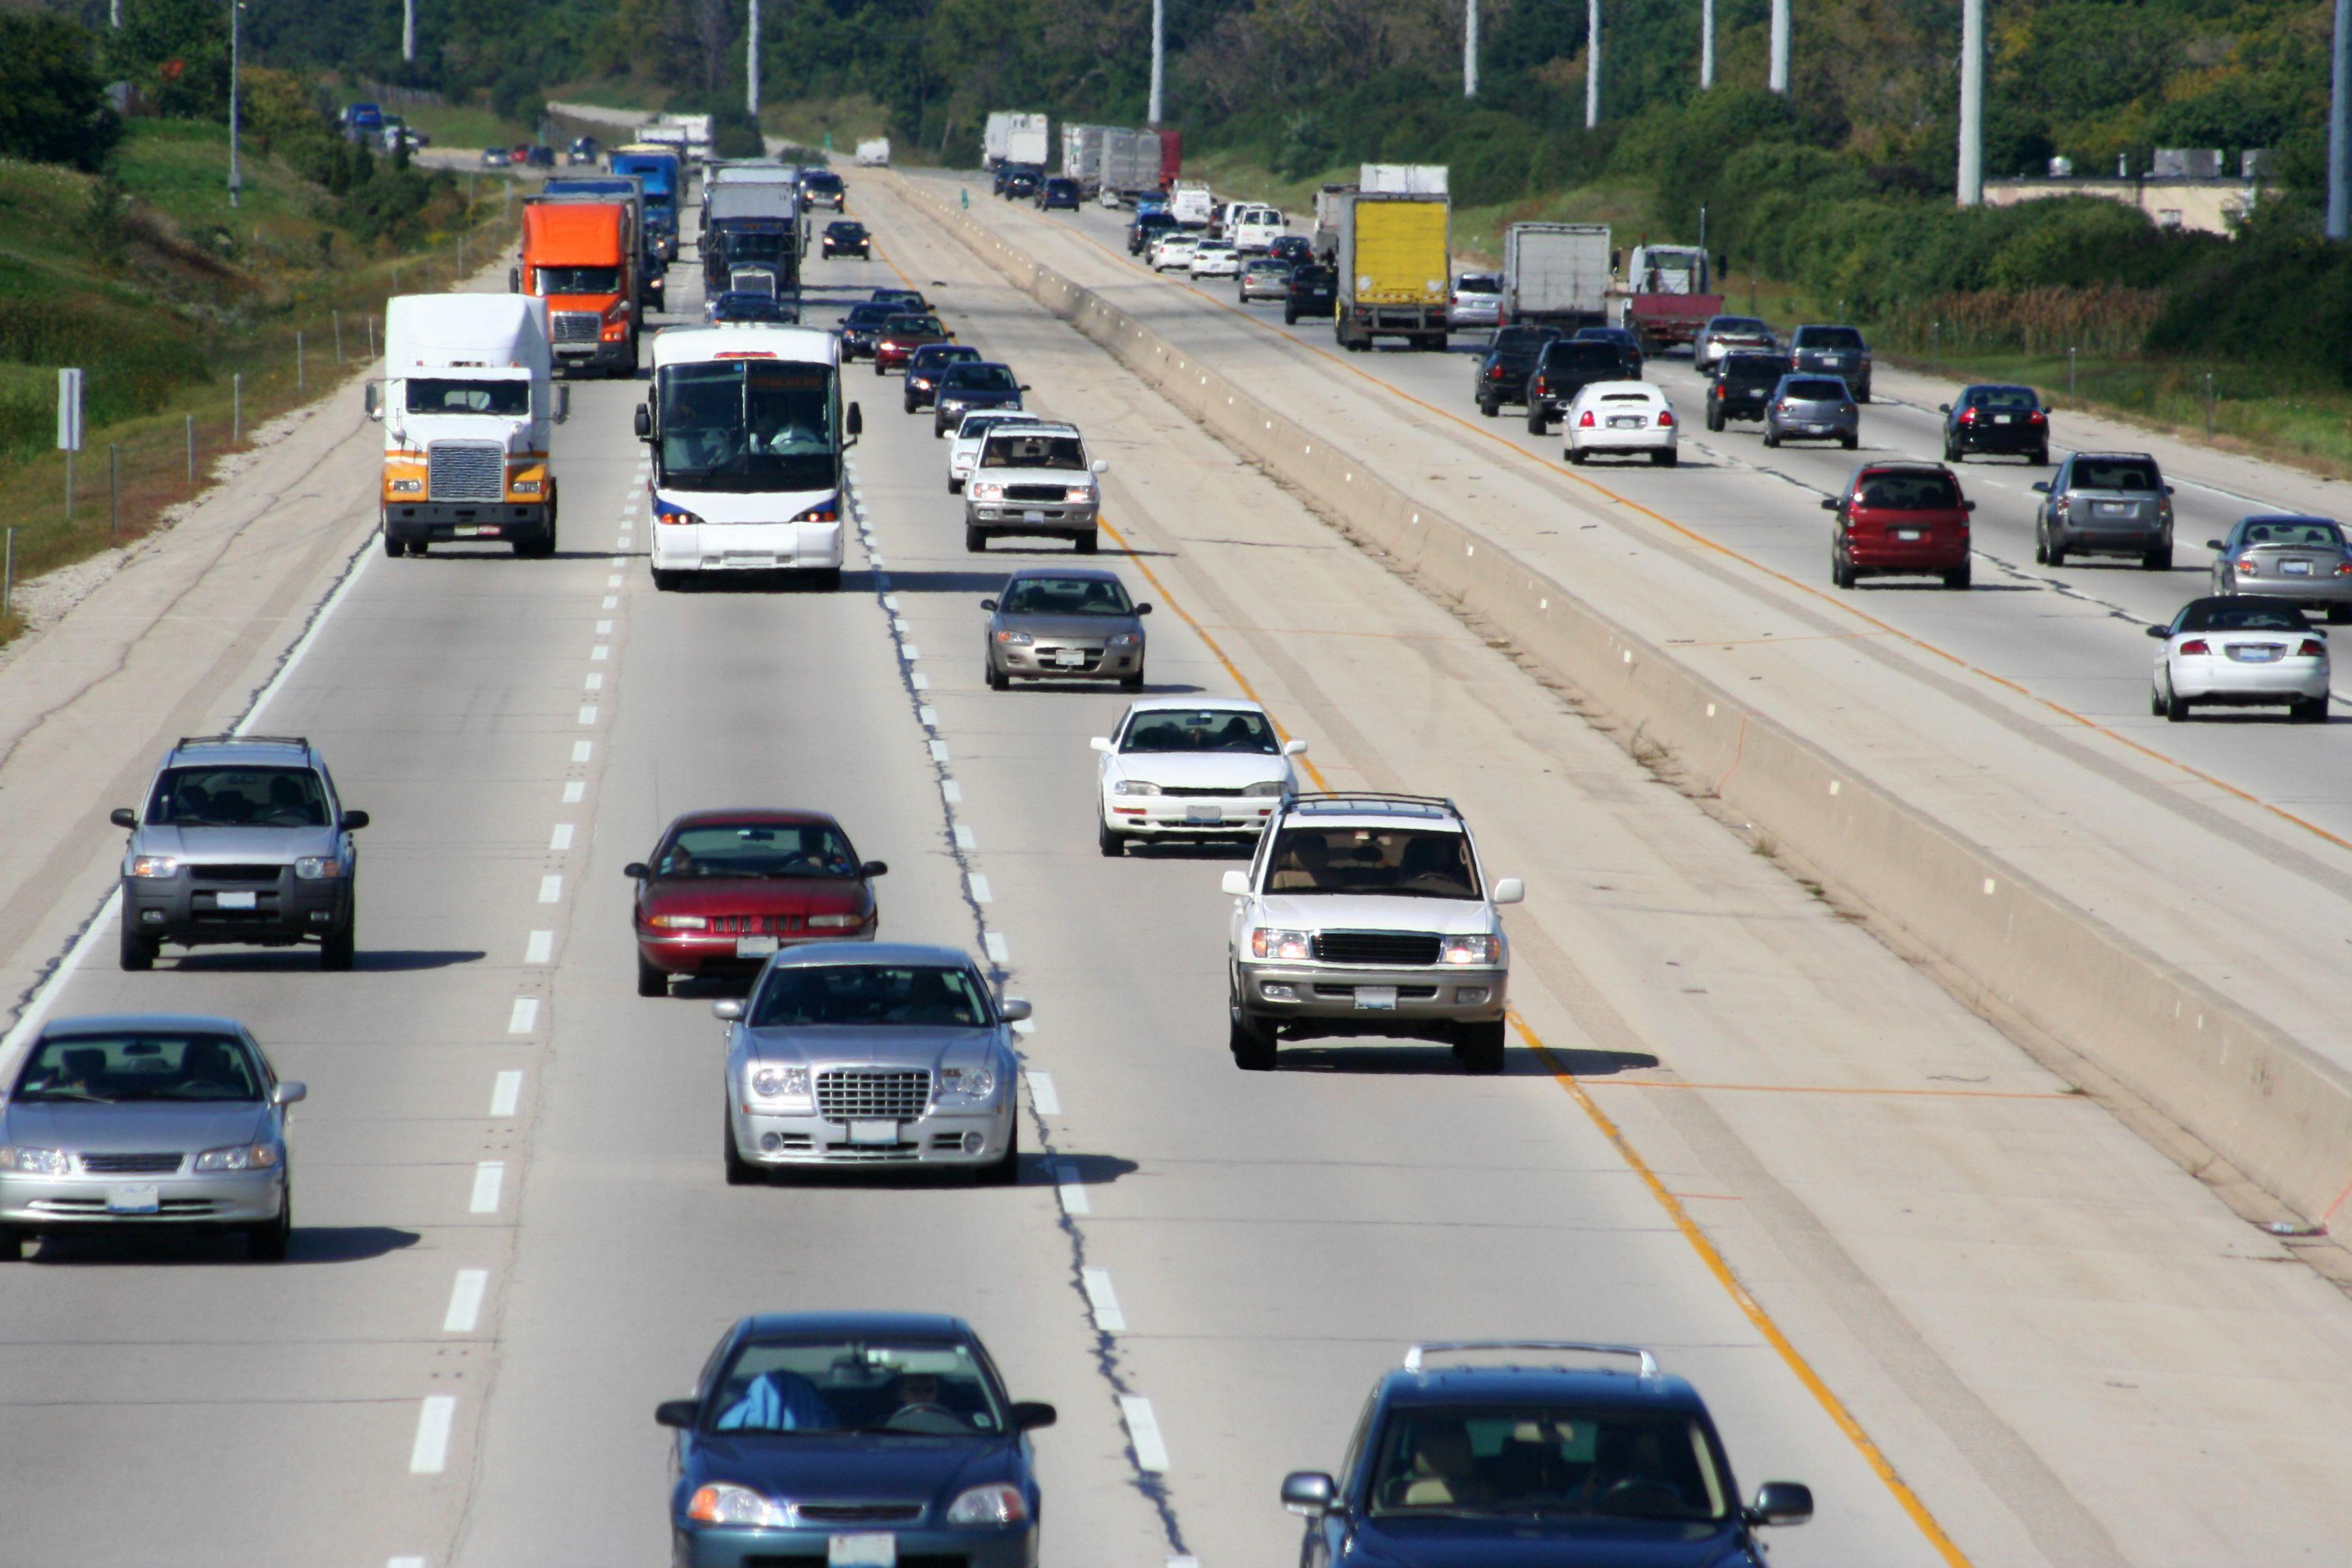 Cracking Down on Uninsured Motorists. The Florida